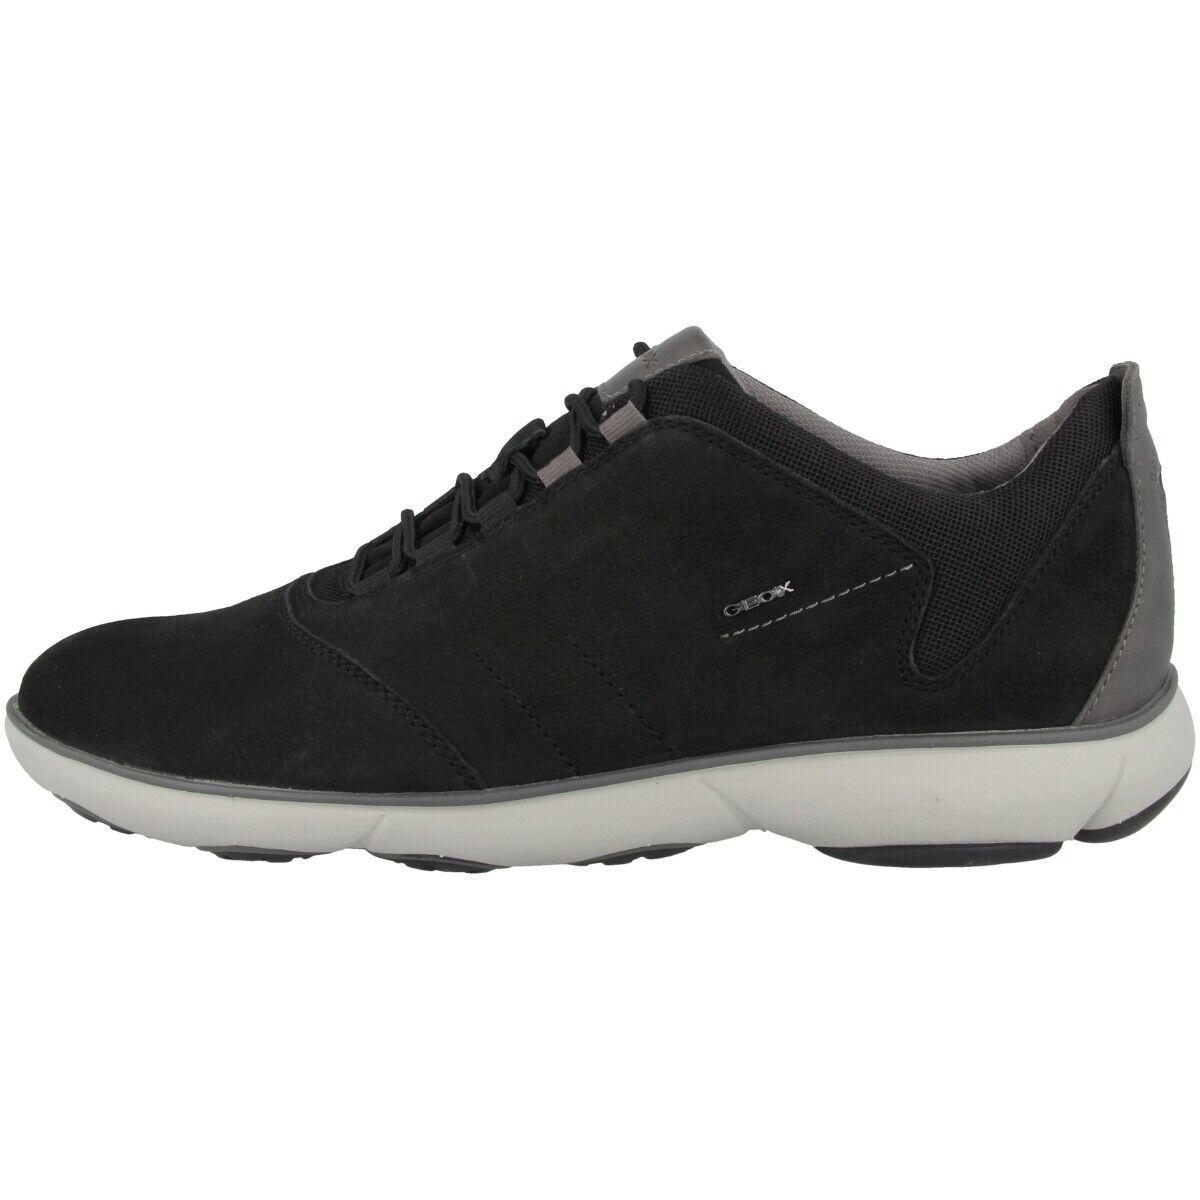 Geox u nebula c sneakers mens leisure shoes Black u74d7c000ltc9999